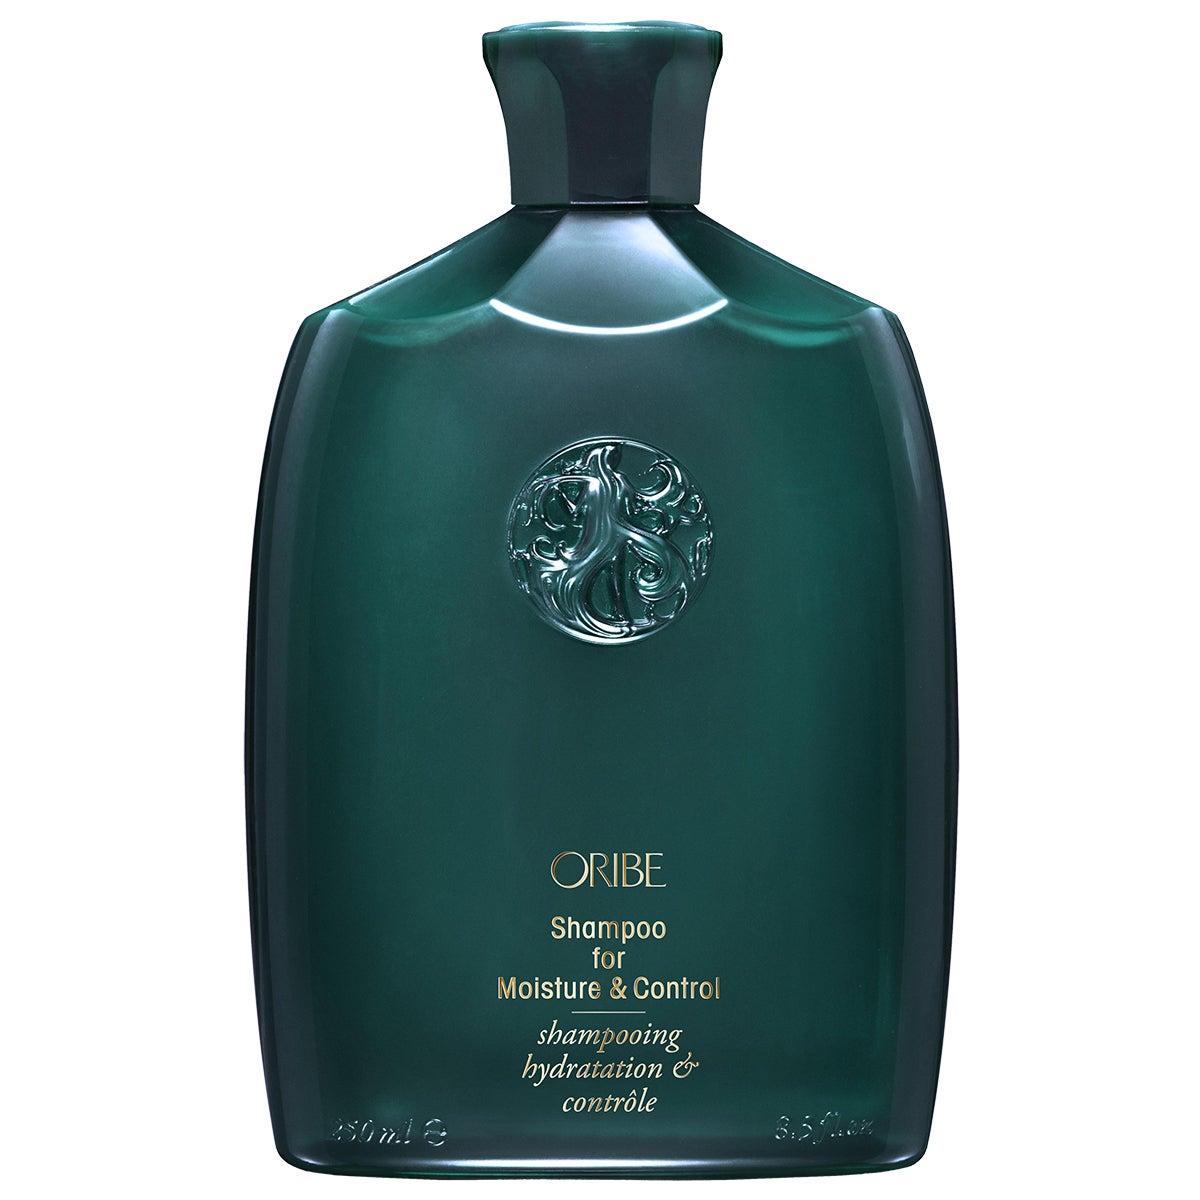 Shampoo for Moisture & Control 250 ml Oribe Schampo